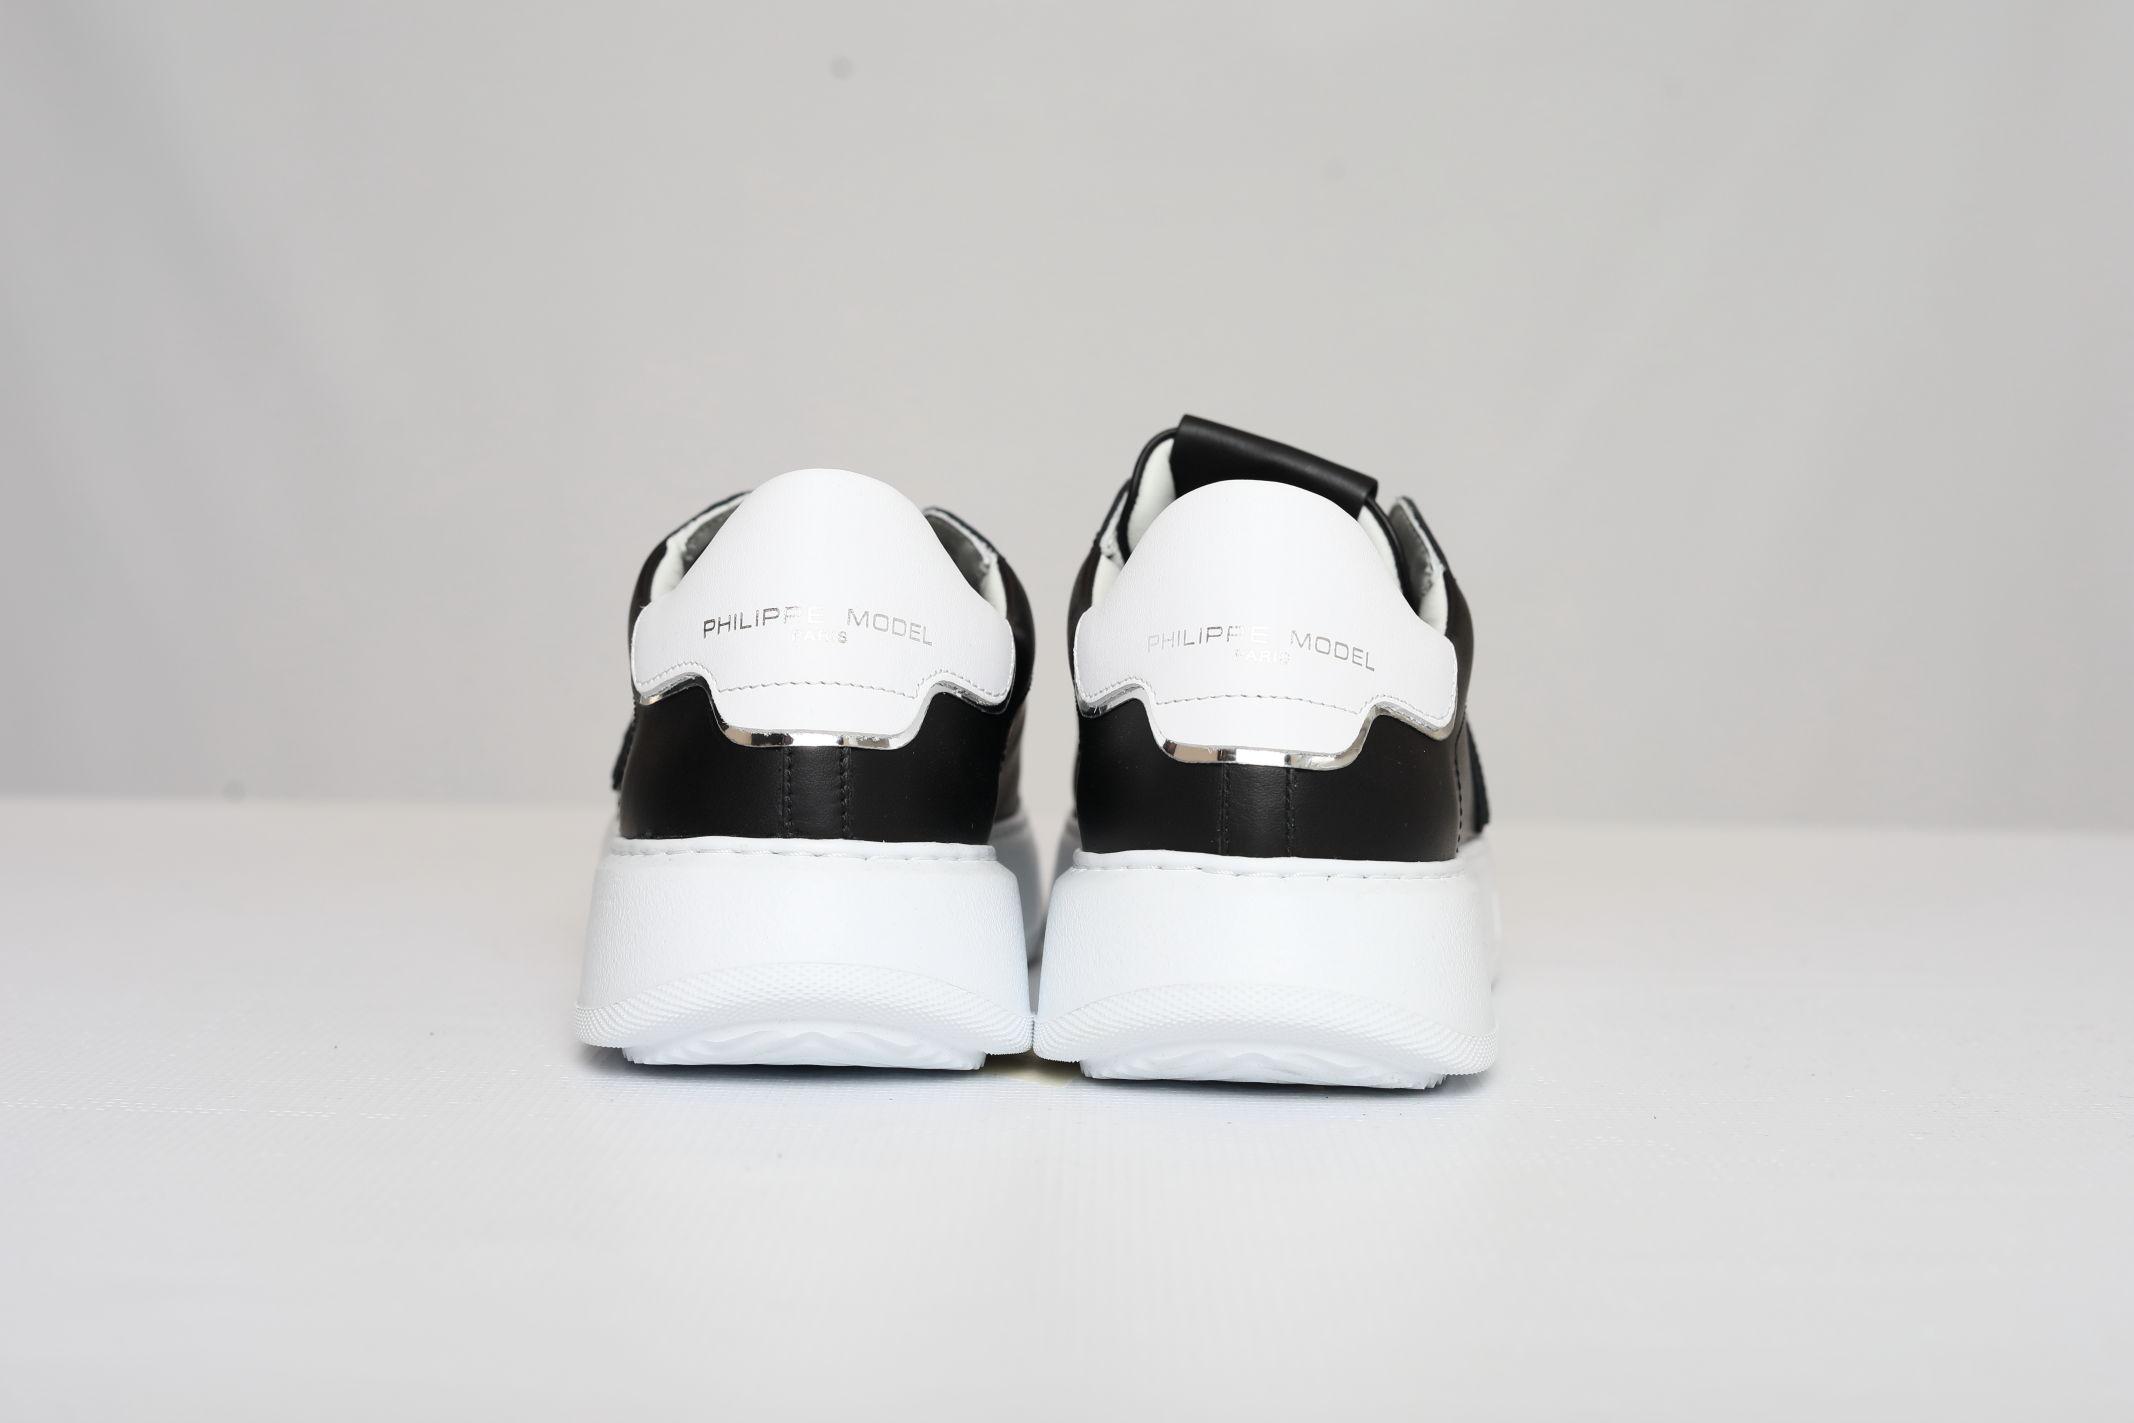 TEMPLE LOW MAN PHILIPPE MODEL   Shoes   BTLUV002